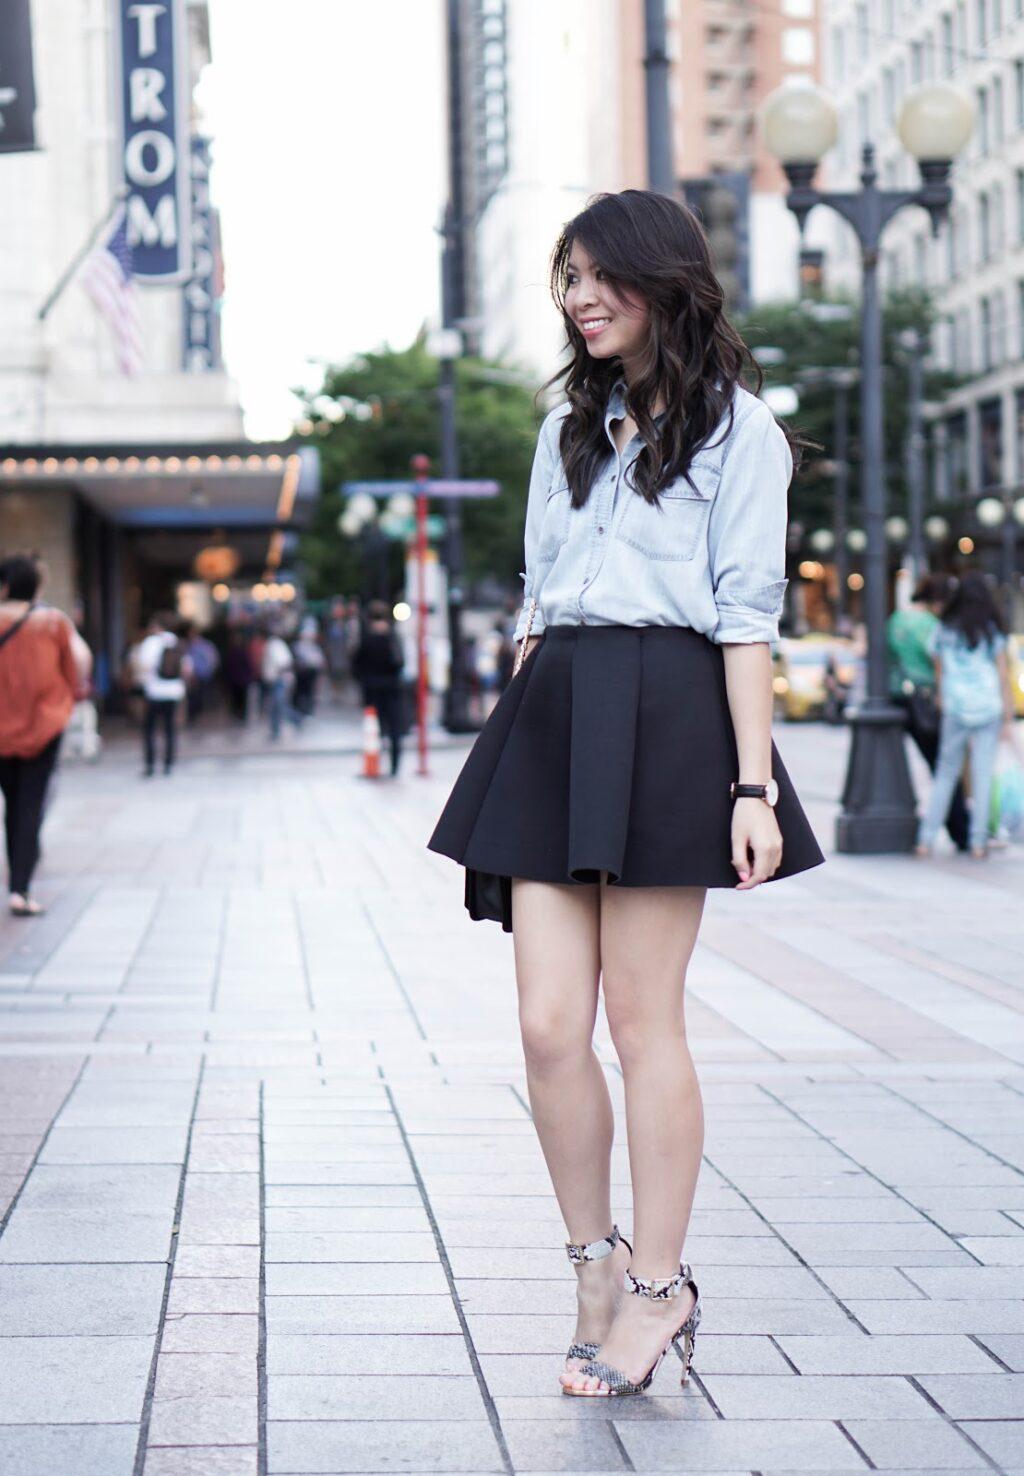 justatinabit-club-monaco-rylie-enamel-button-up-denim-chambray-shirt-choies-black-pleated-flare-skirt-shoedazzle-ankle-strap-tinsley-shoes